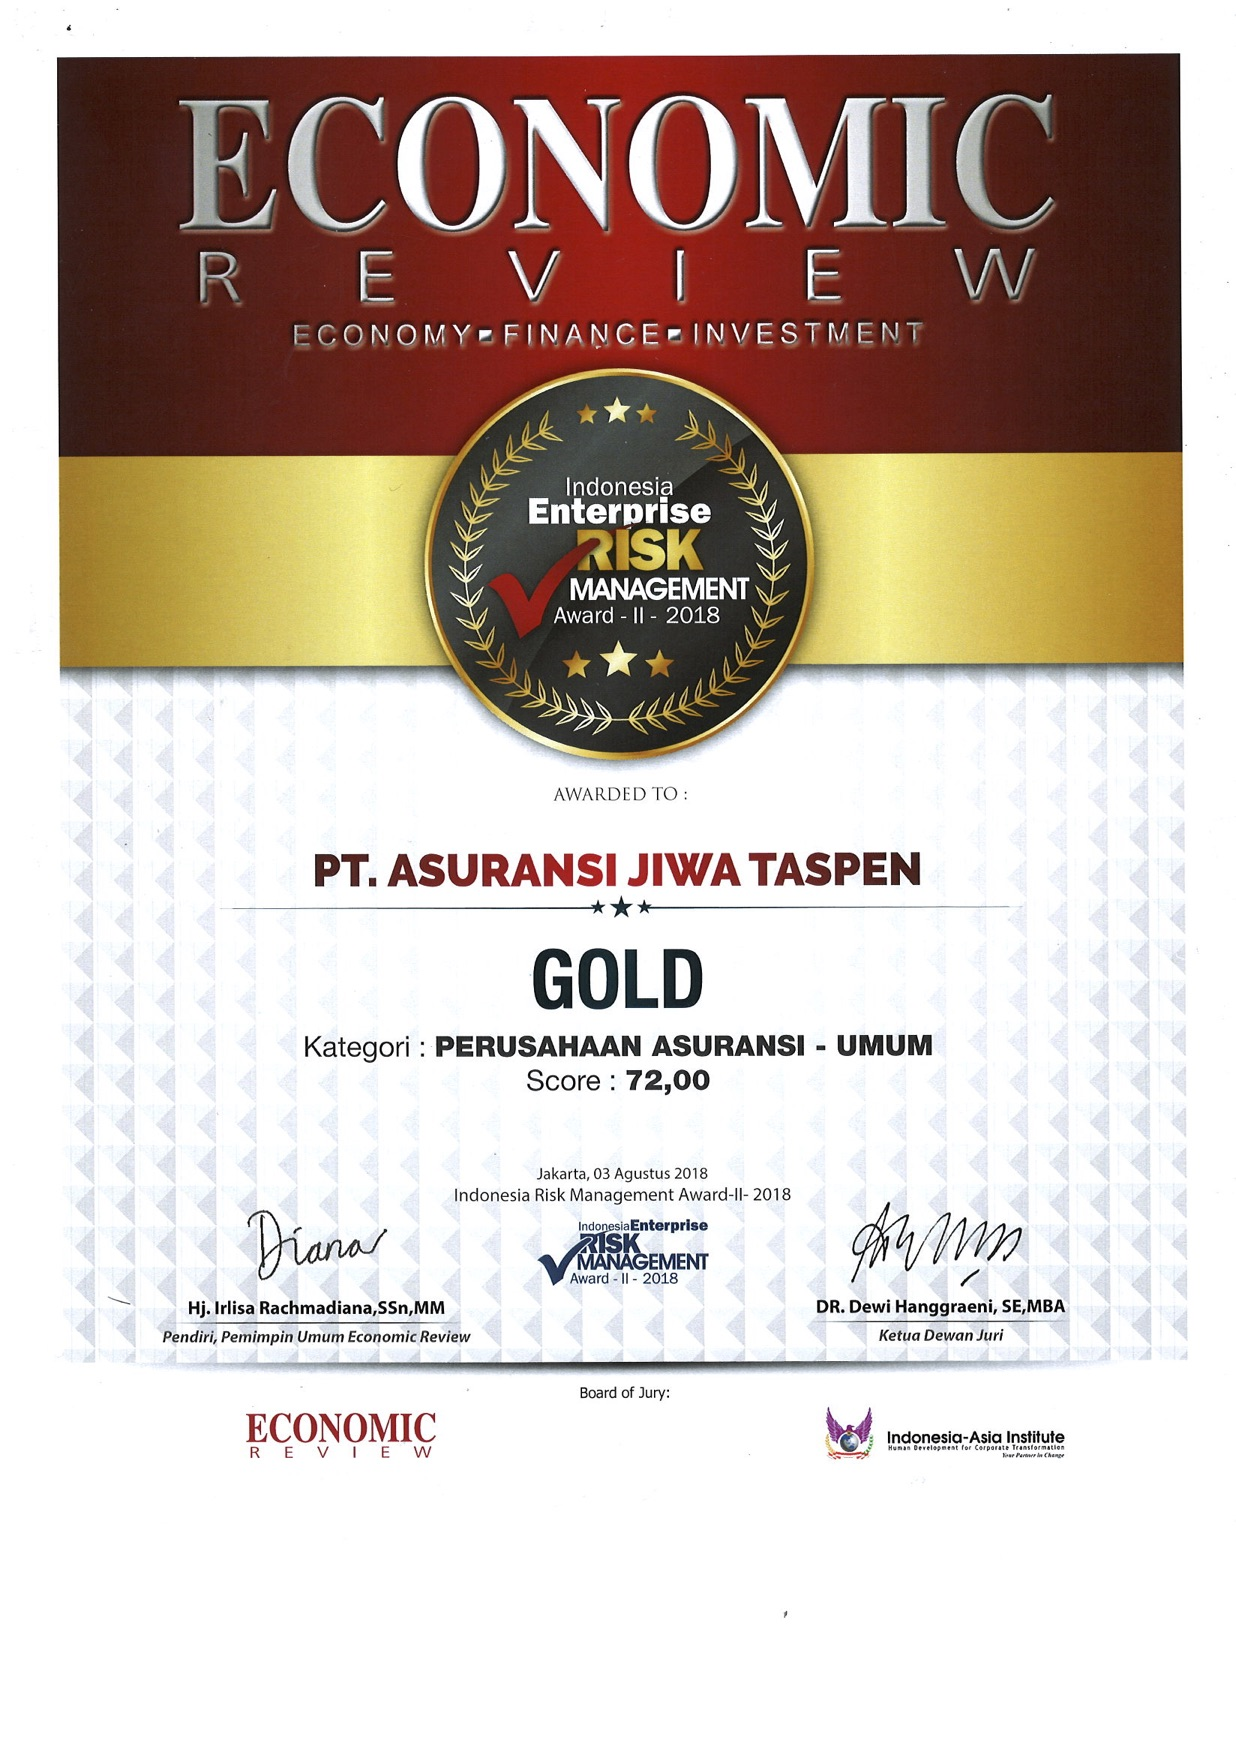 IERMA Score -Economic Review